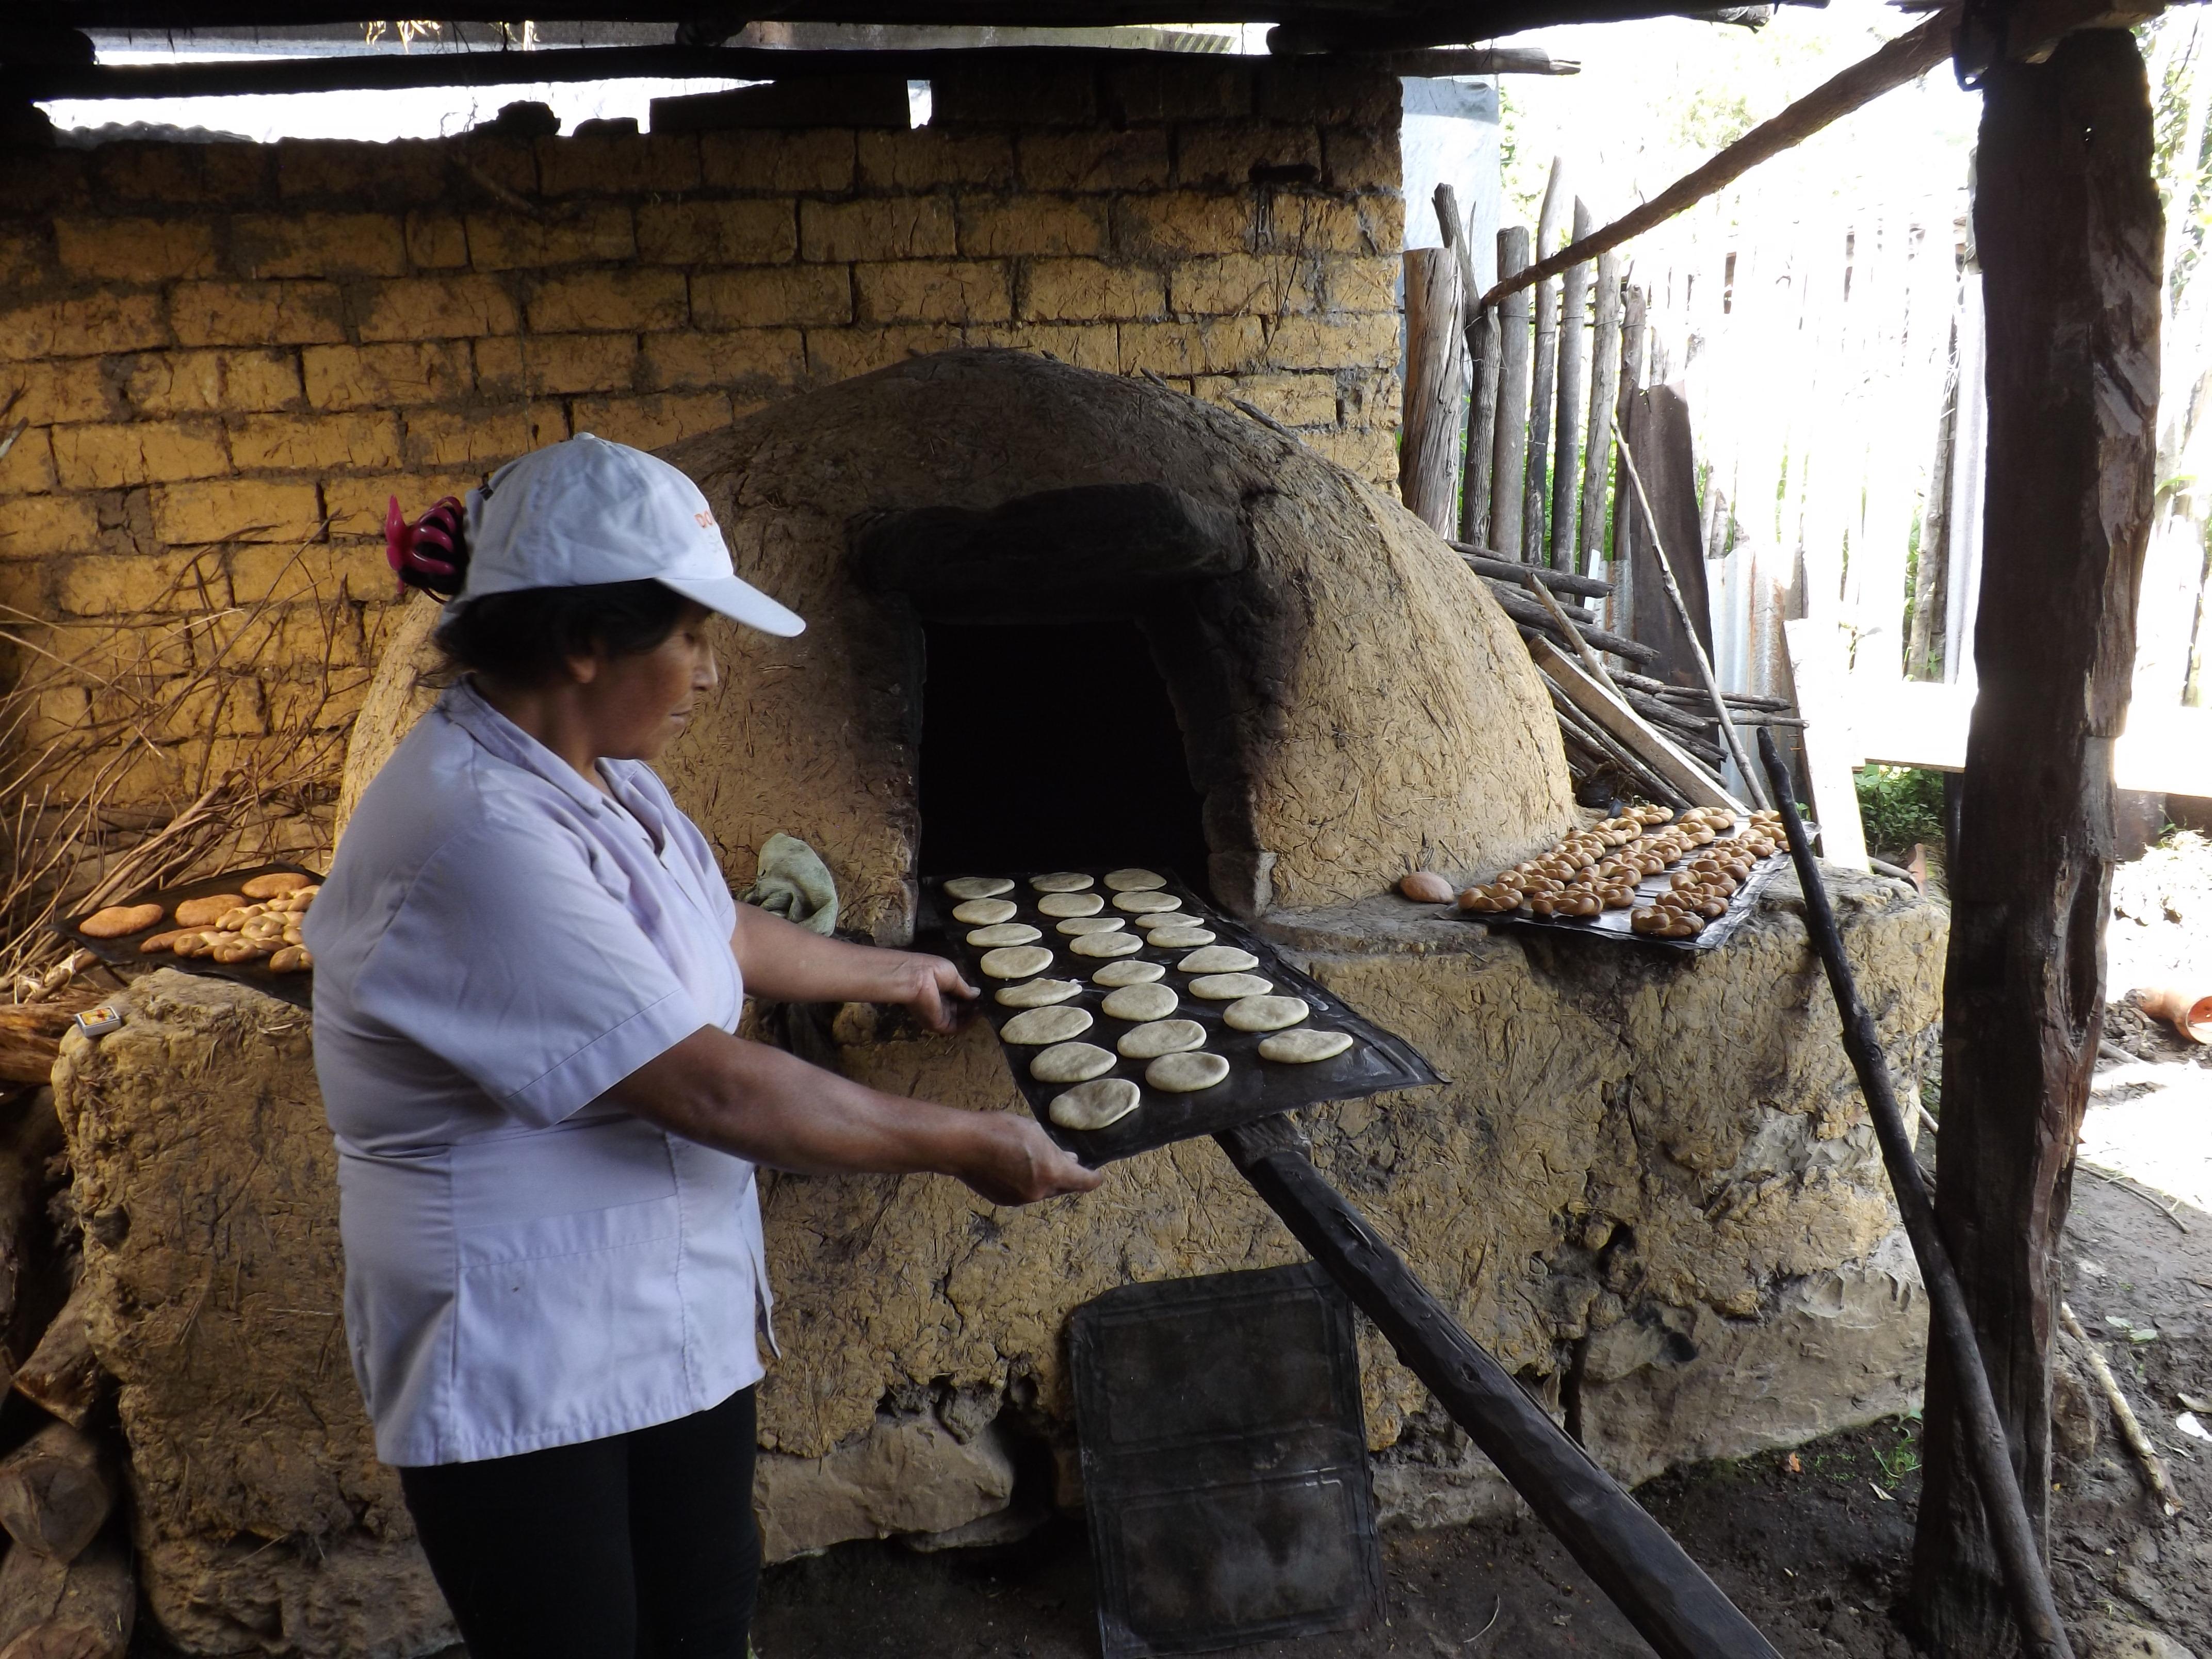 Brot backen, traditionnelle Aktivitäten in Cuispes